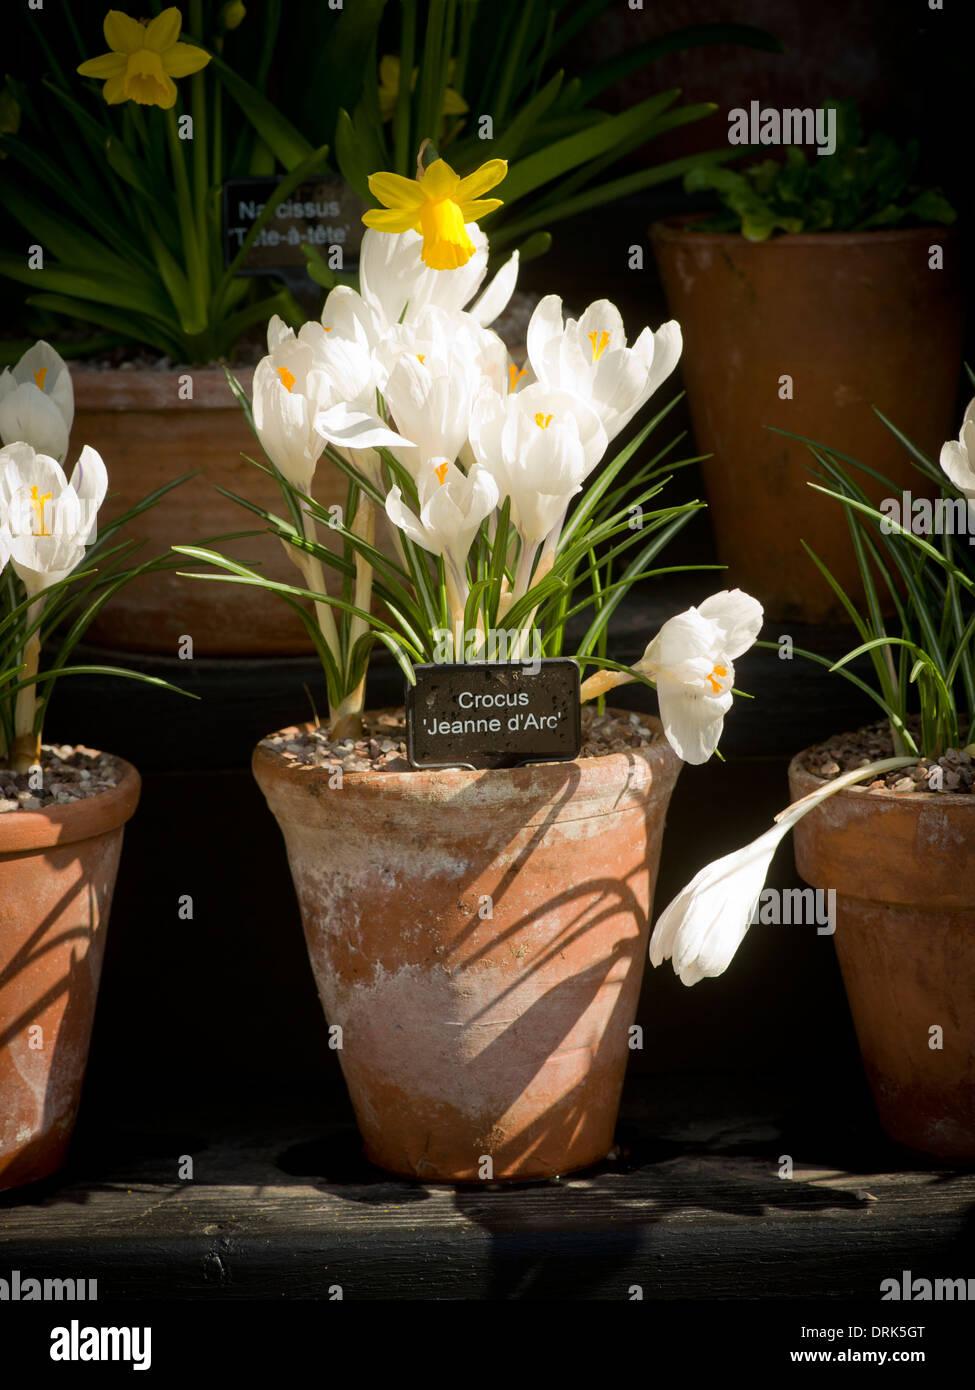 Crocus 'Jeanne d'Arc' in terracotta plant pot. - Stock Image